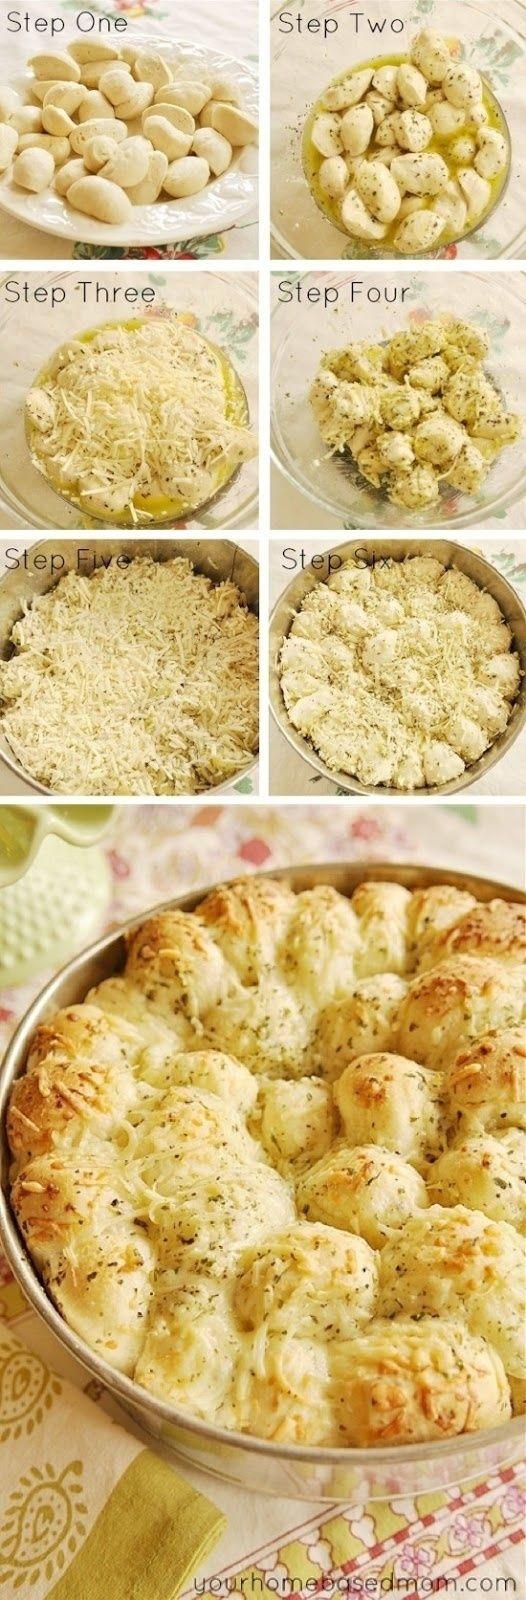 Garlic Cheese Pull-Apart Bread - XnY DIY Tutorials